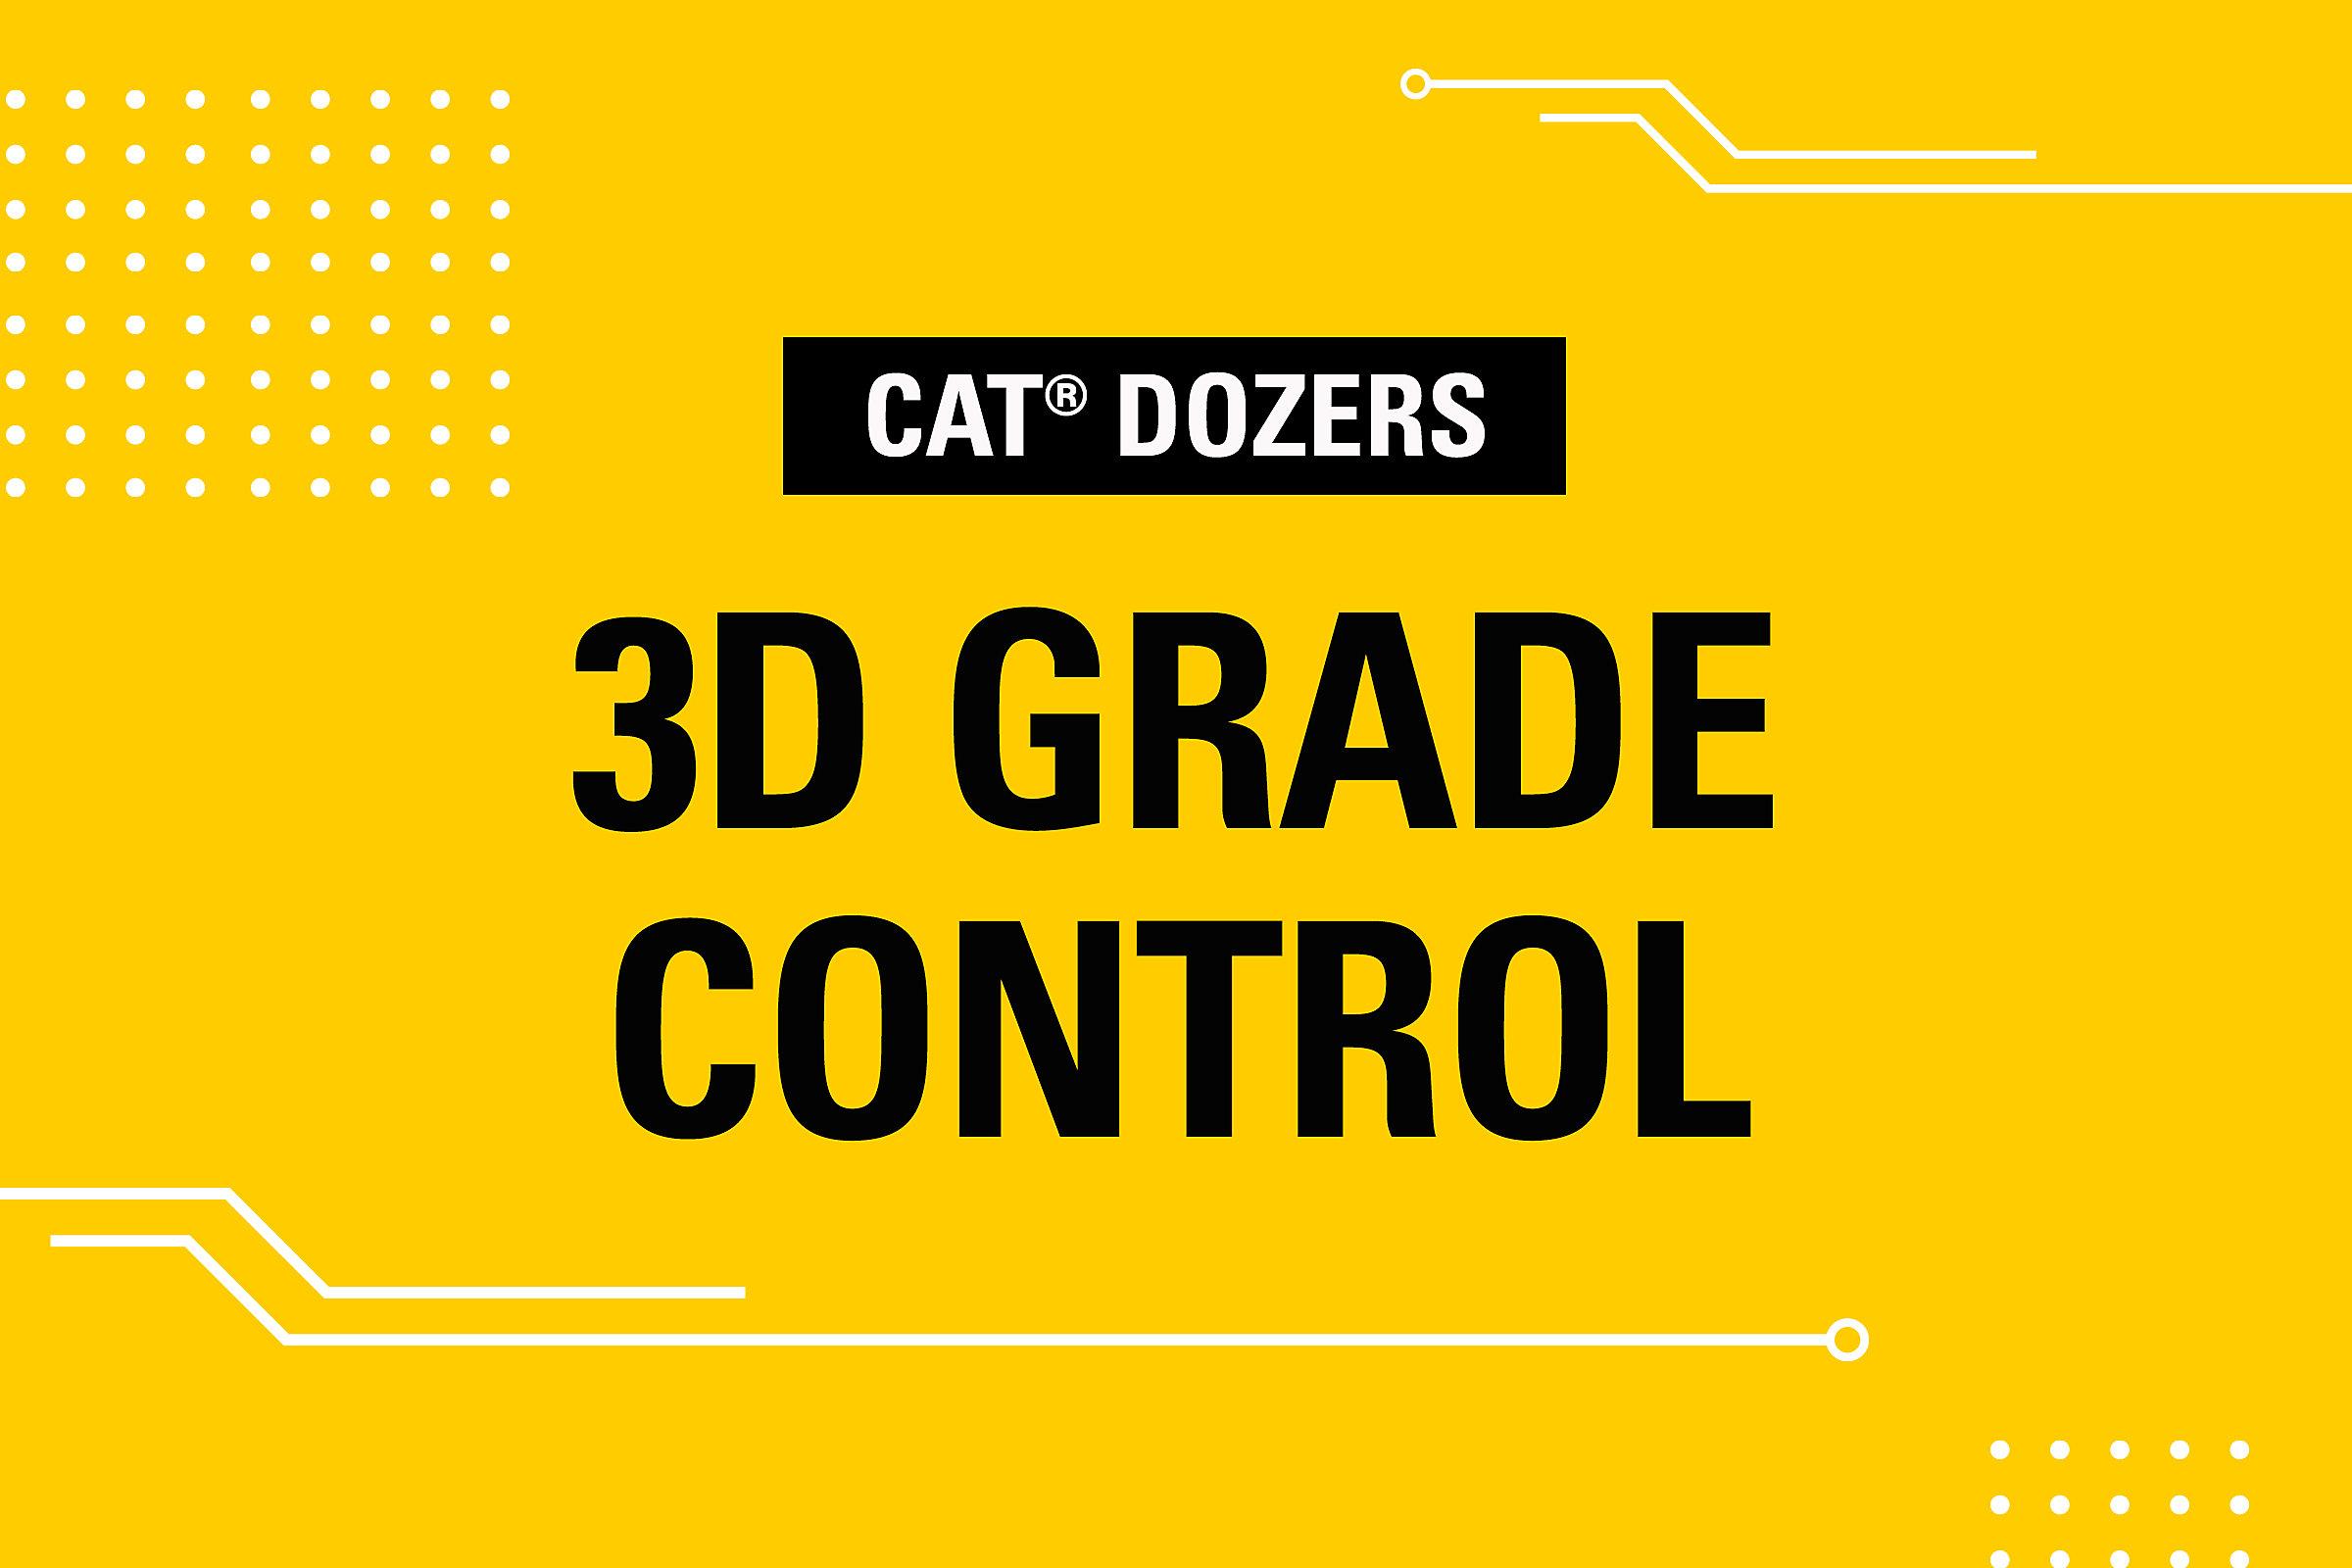 Dozer 3D Grade Control